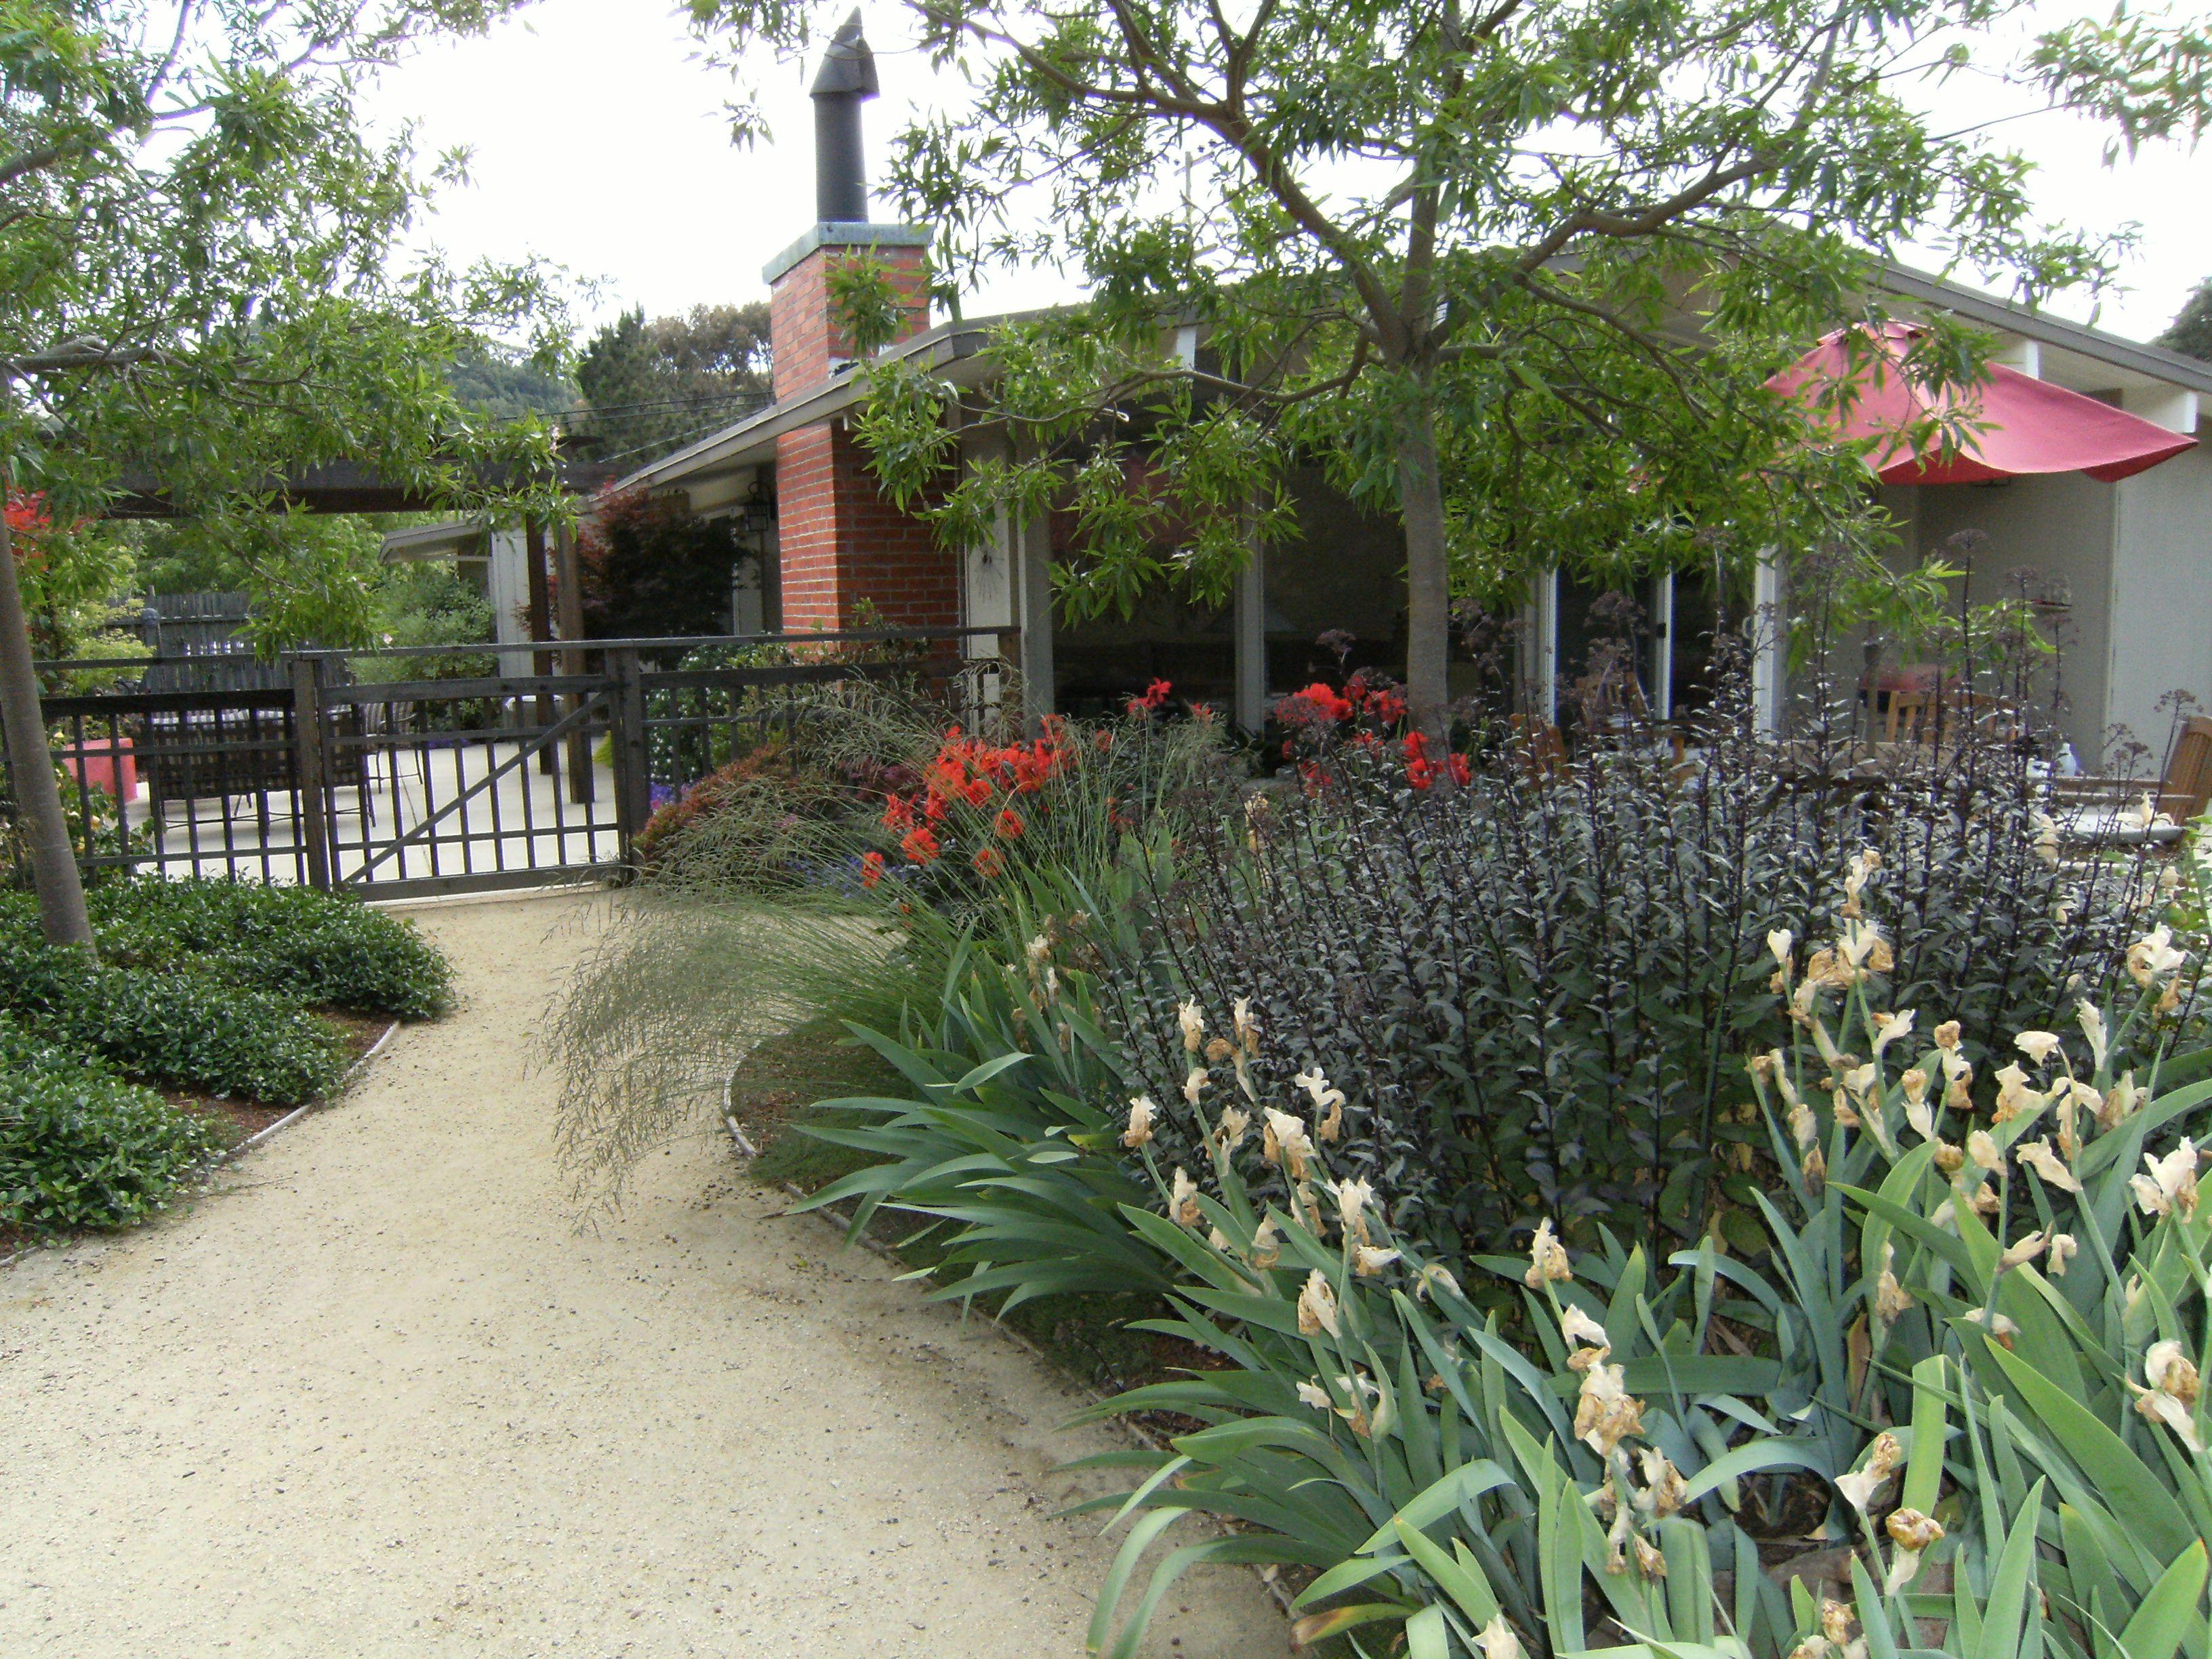 Decomposed Granite Patios   Decomposed granite patio ... on Decomposed Granite Backyard Ideas id=31799